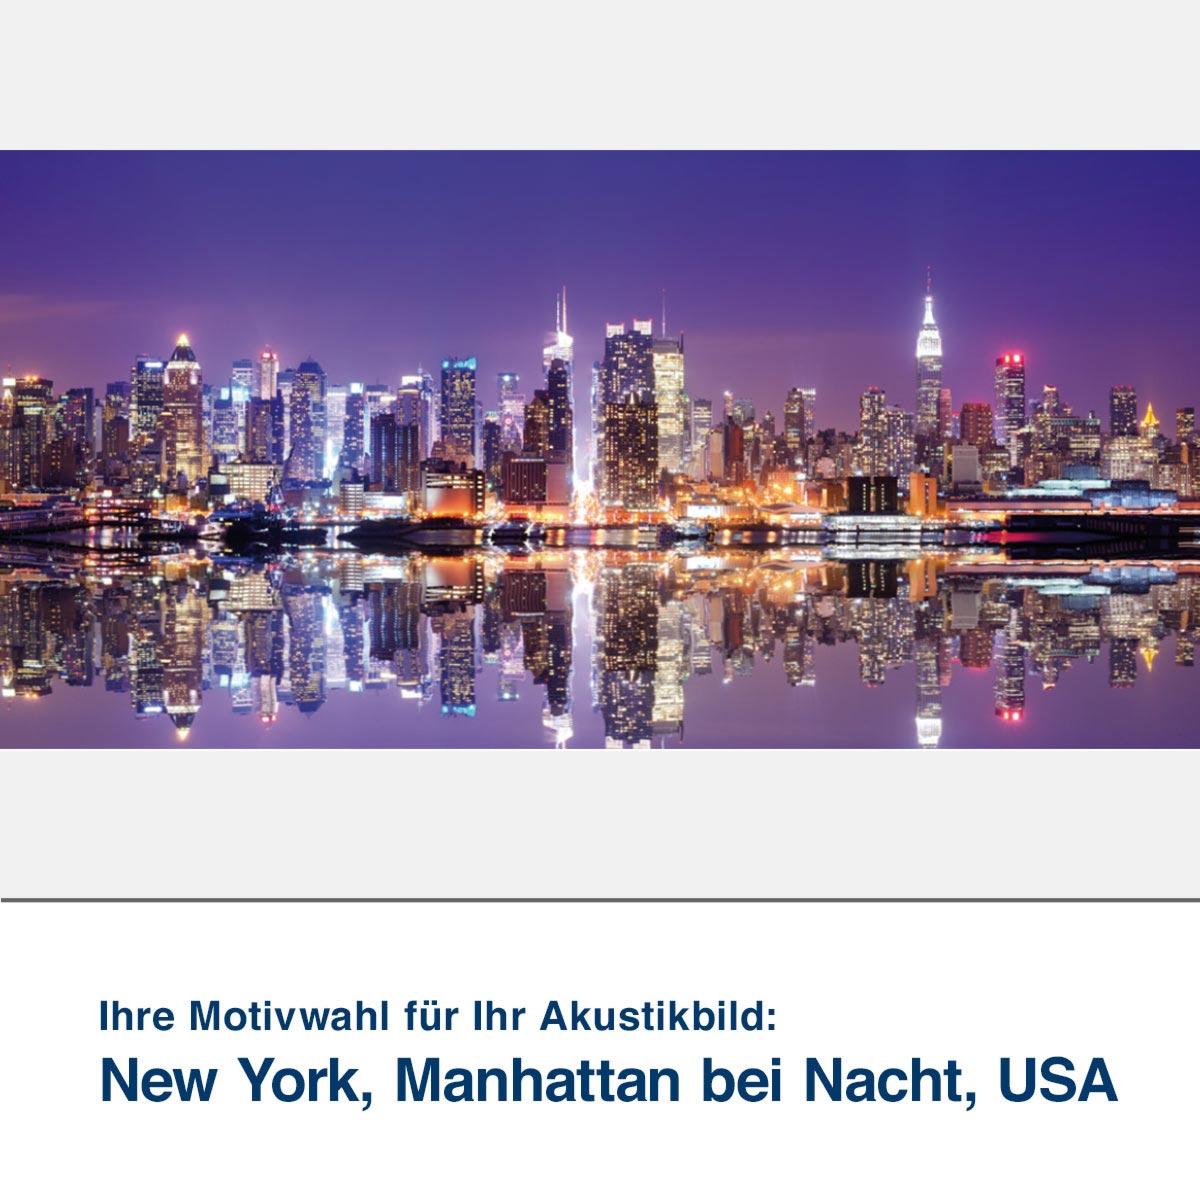 Akustikbild Motiv New York, Manhattan bei Nacht, USA